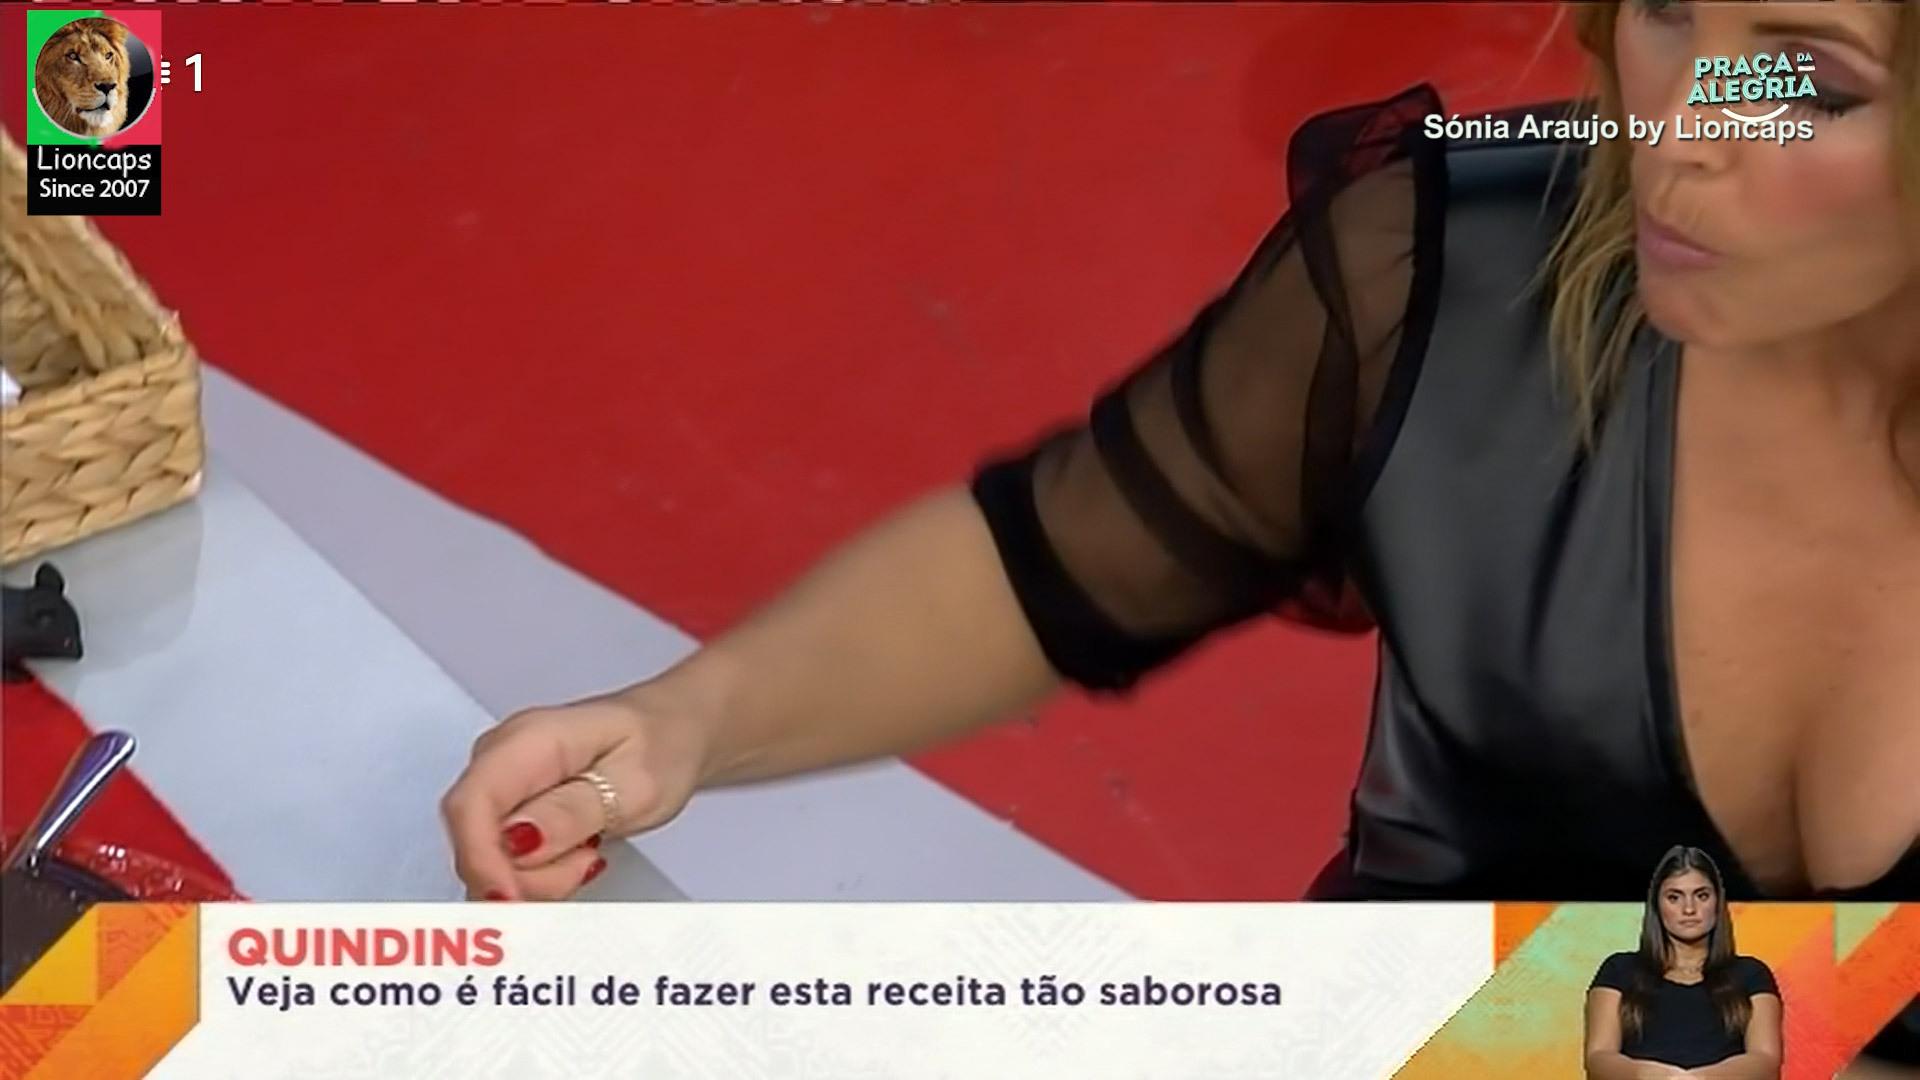 sonia_araujo_praca_lioncaps_27_03_2021_02 (1).jpg